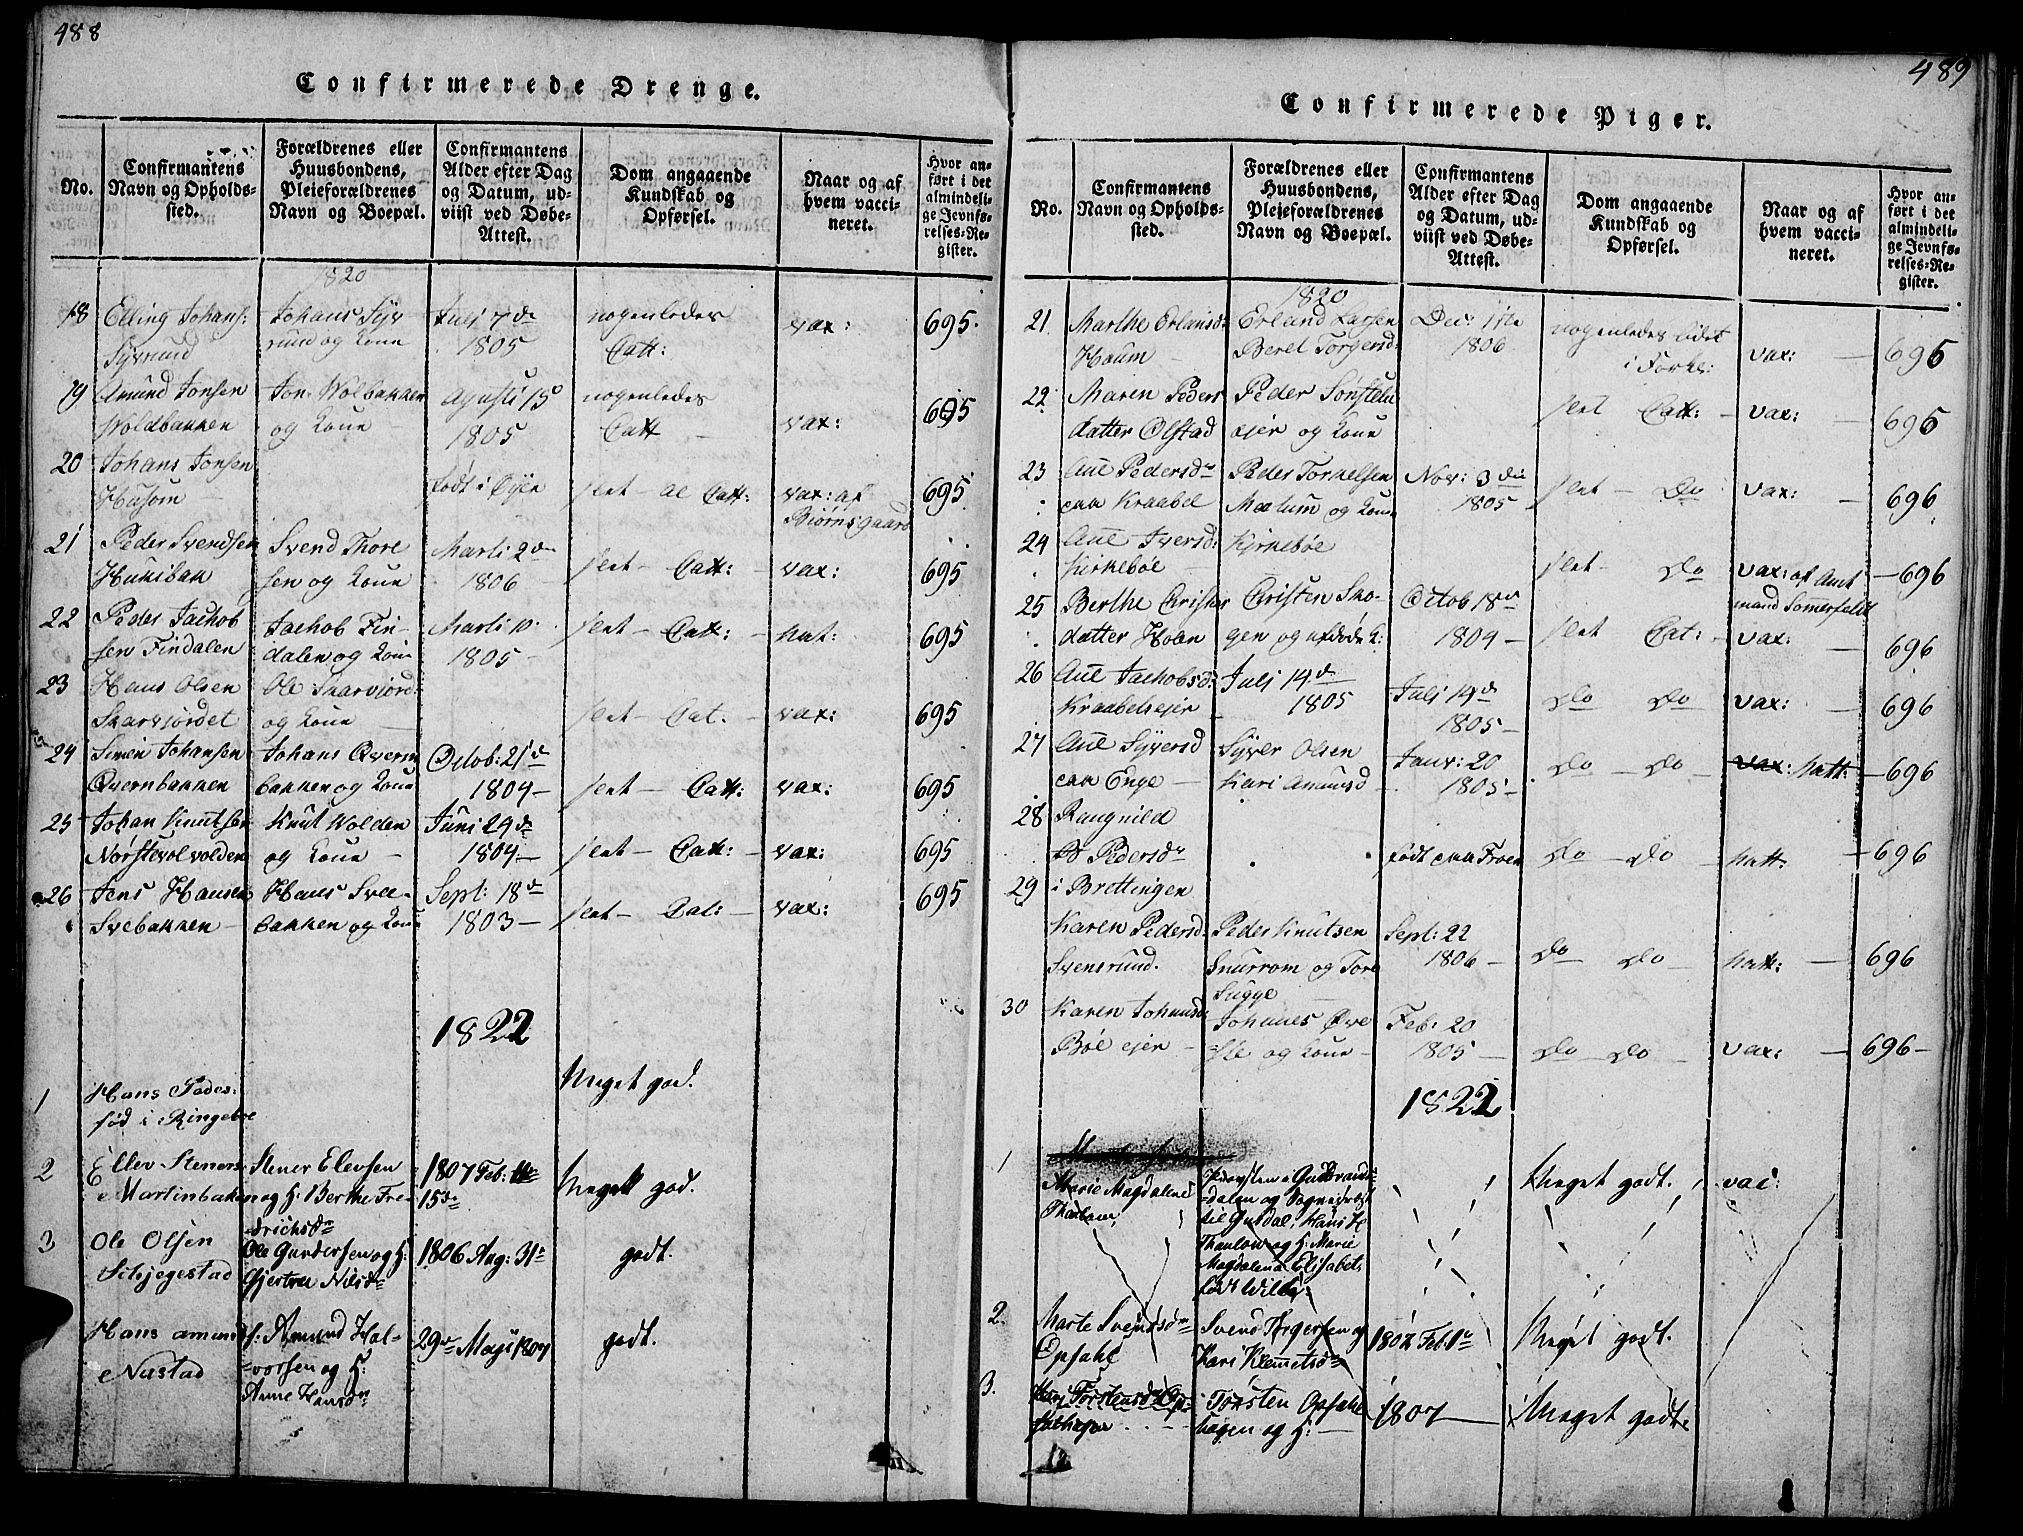 SAH, Gausdal prestekontor, Ministerialbok nr. 5, 1817-1829, s. 488-489